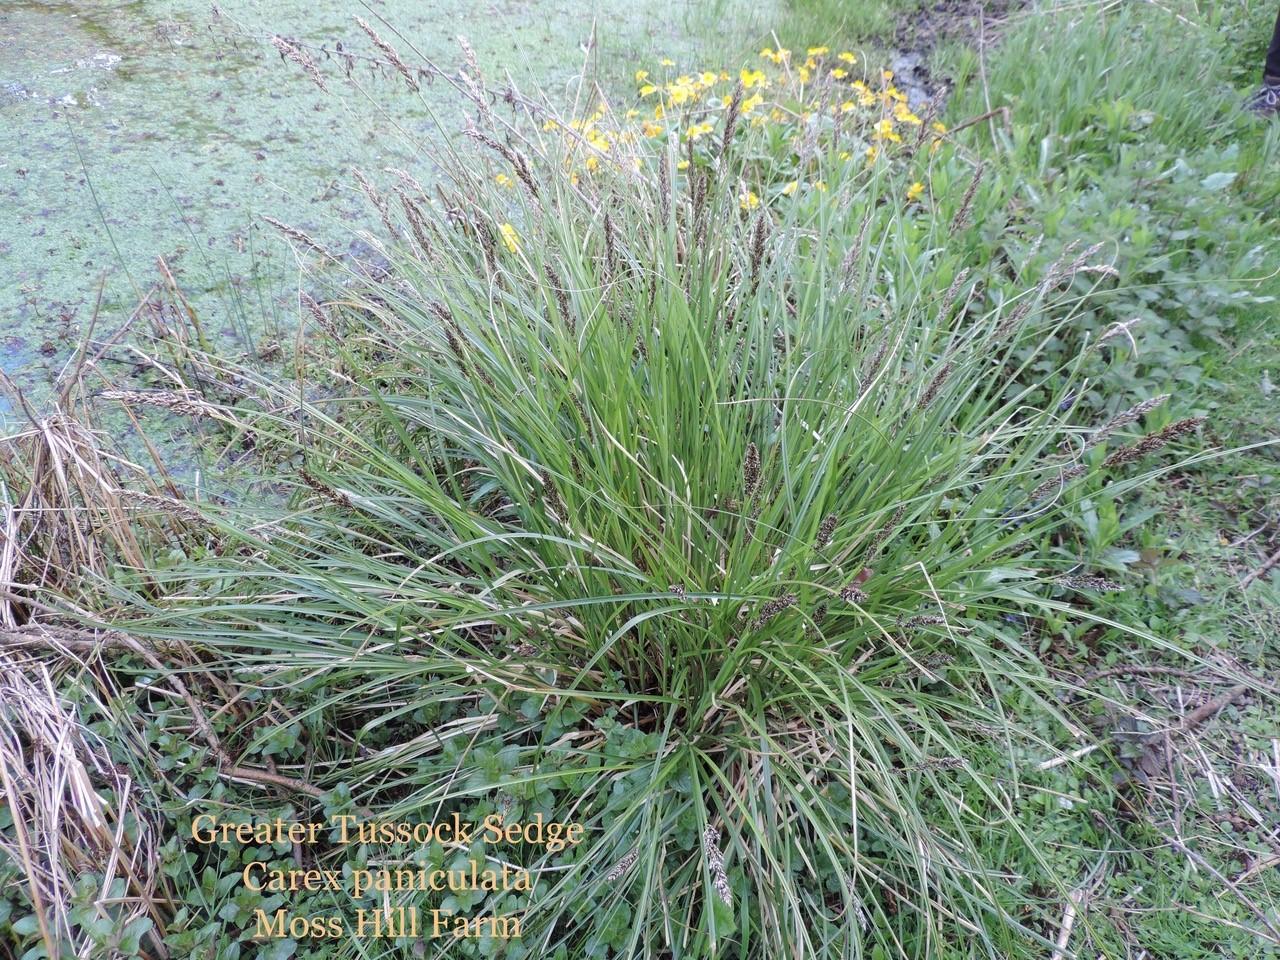 Greater Tussock Sedge (Carex paniculata), Moss Hill Farm